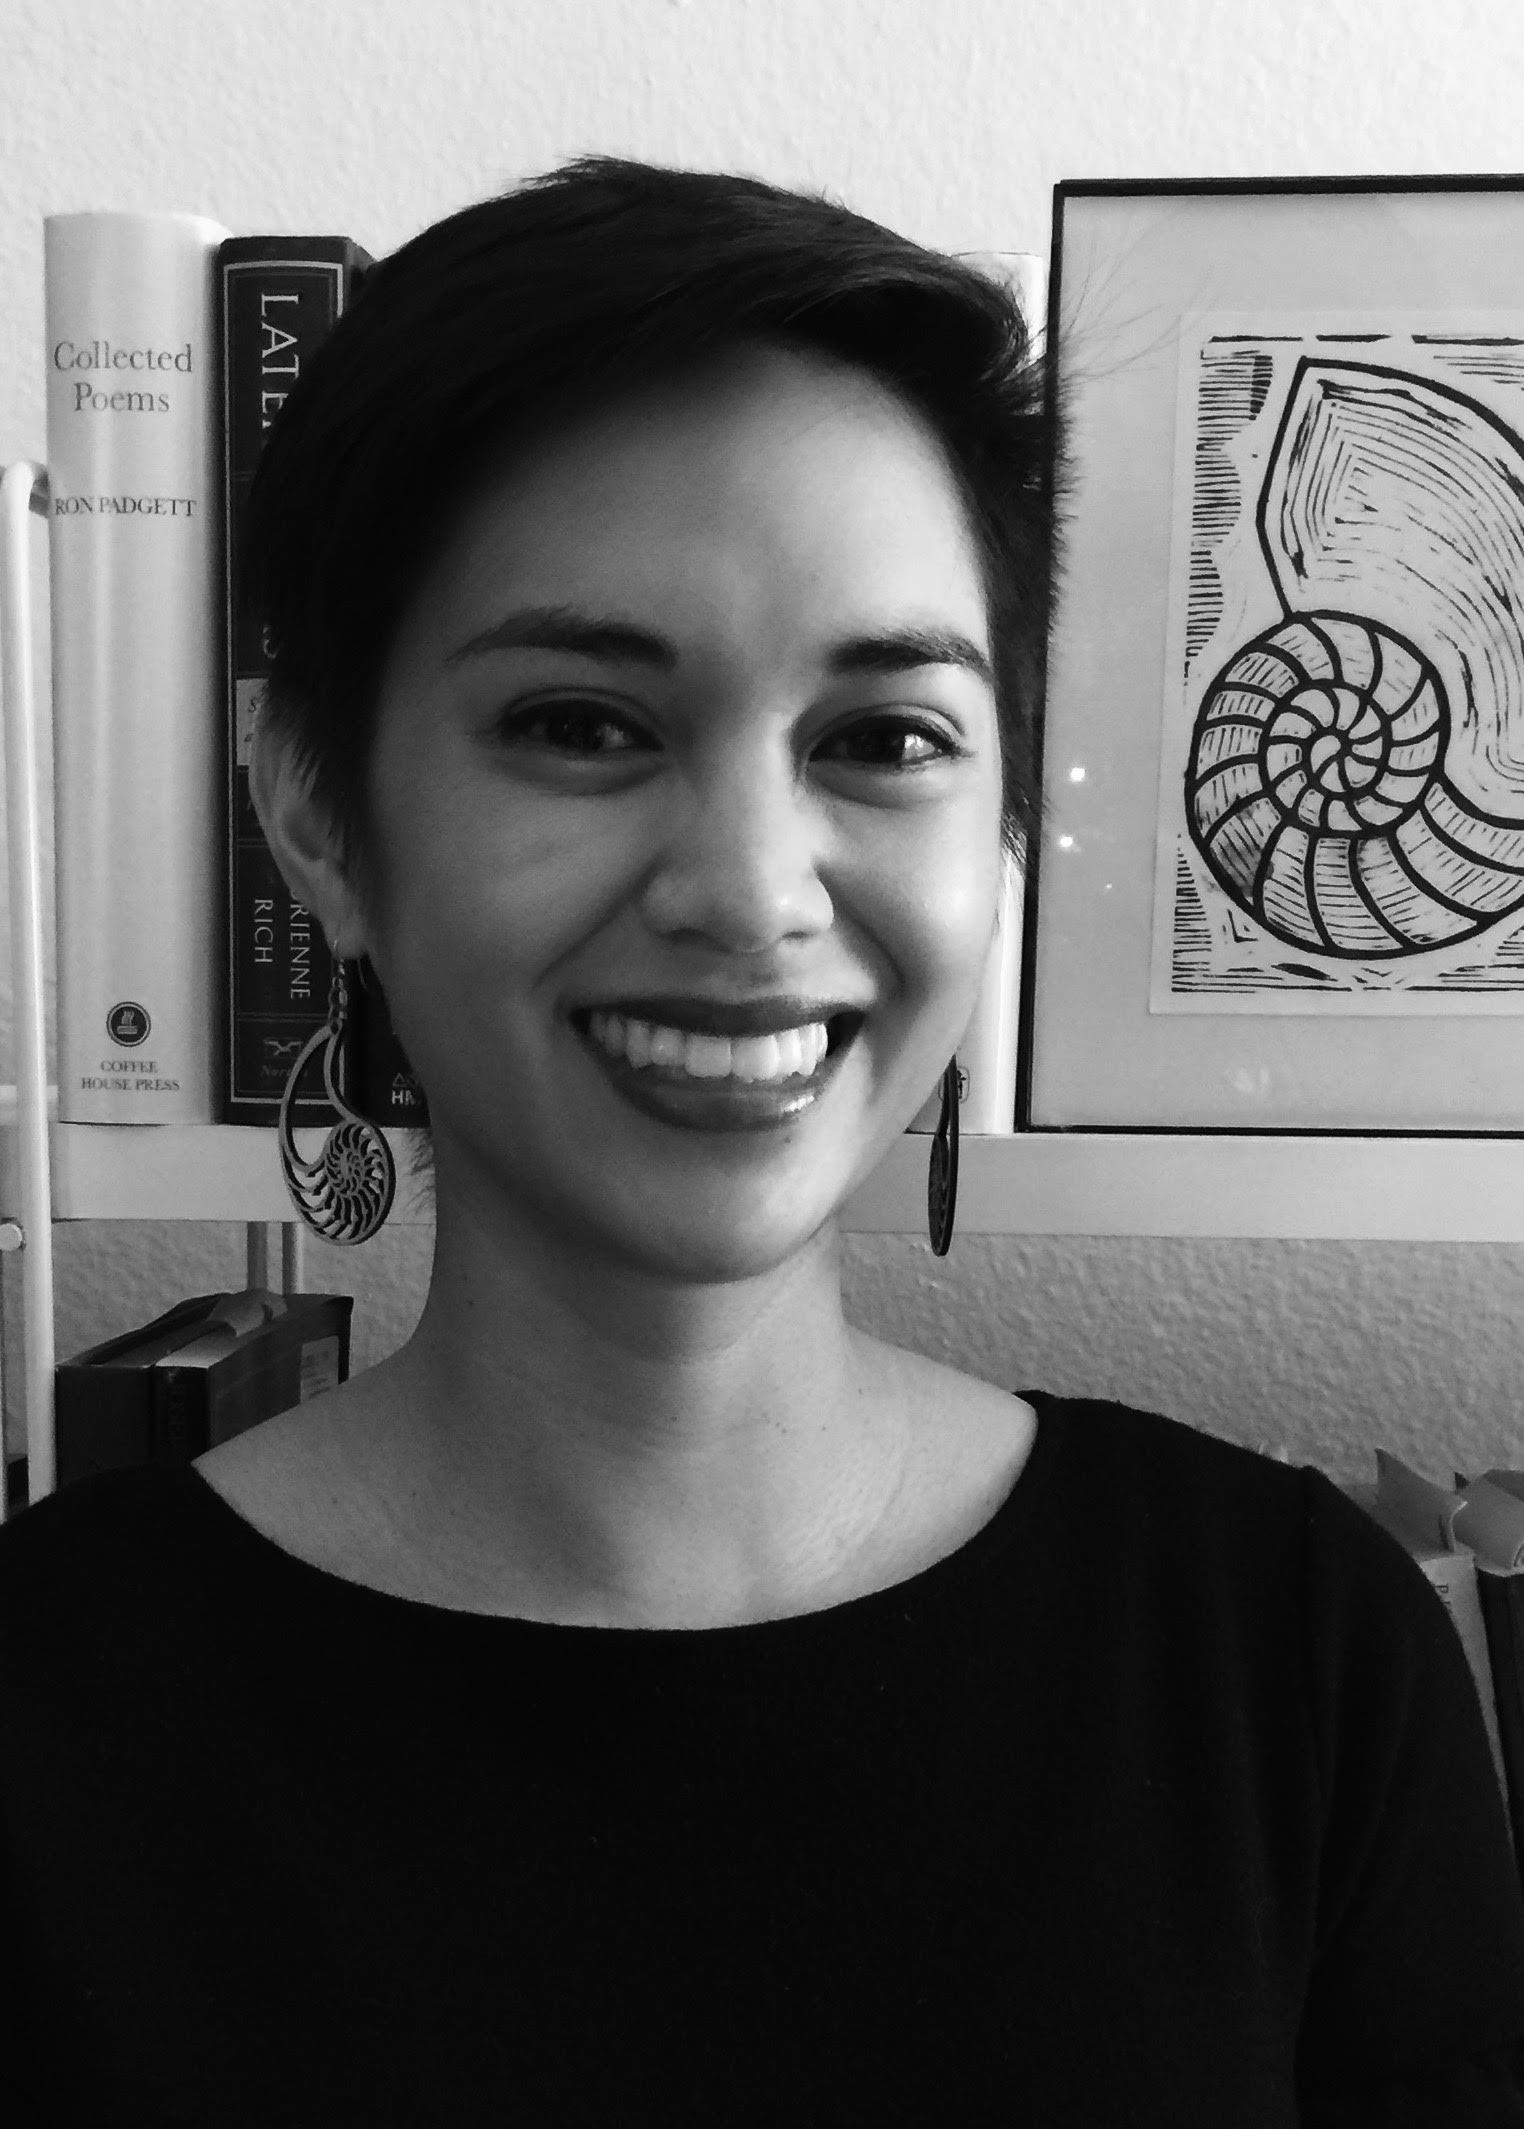 Author Rachelle Cruz